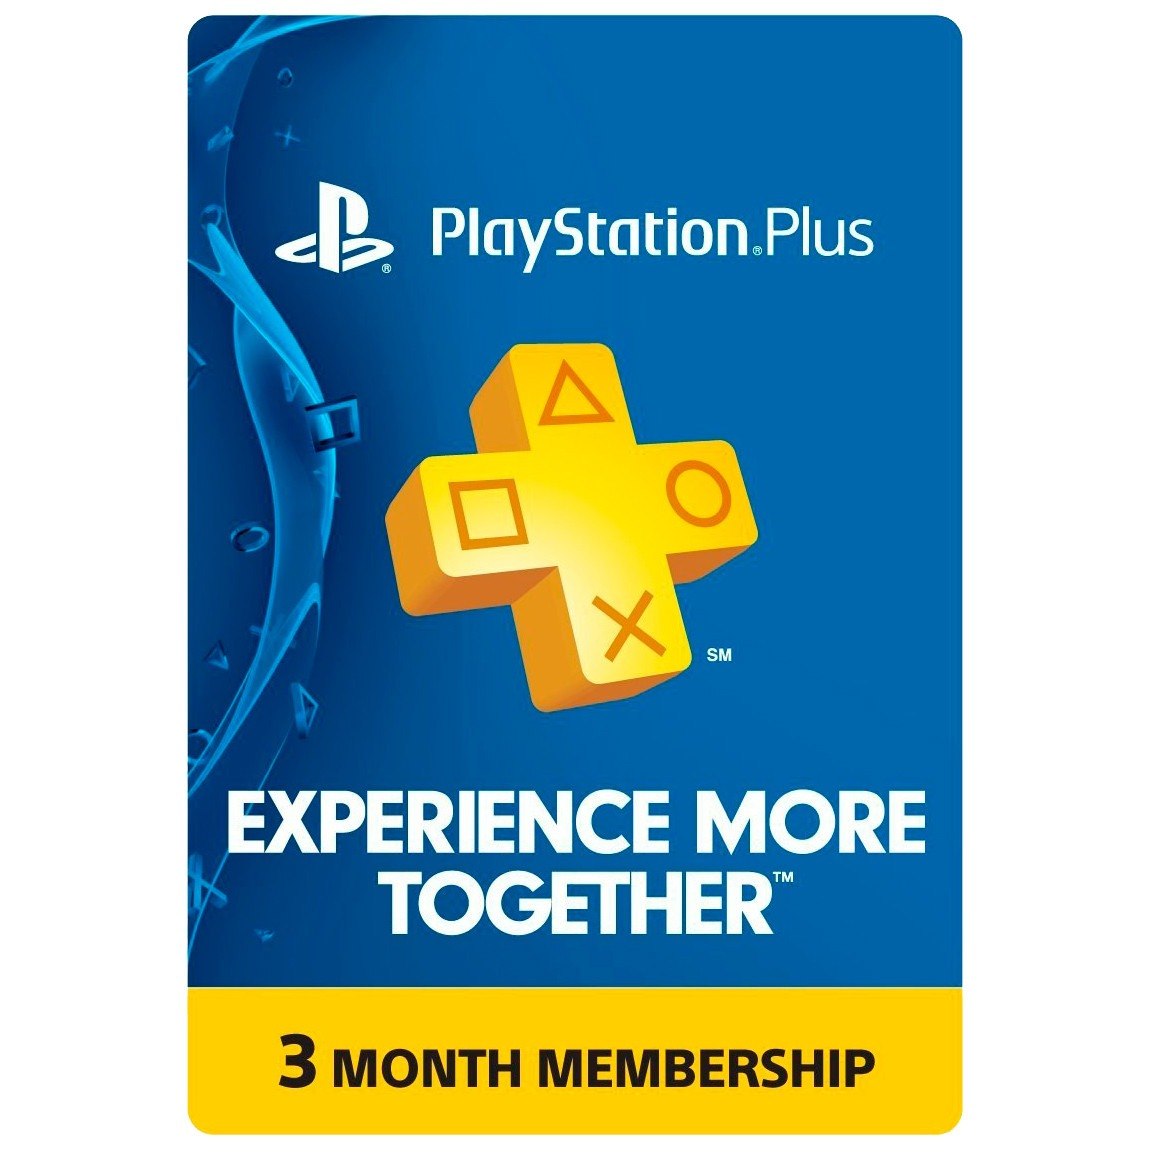 Playstation plus 3 meses ps3 ps4 psvita en mercadolibre - Psn plus 3 meses ...